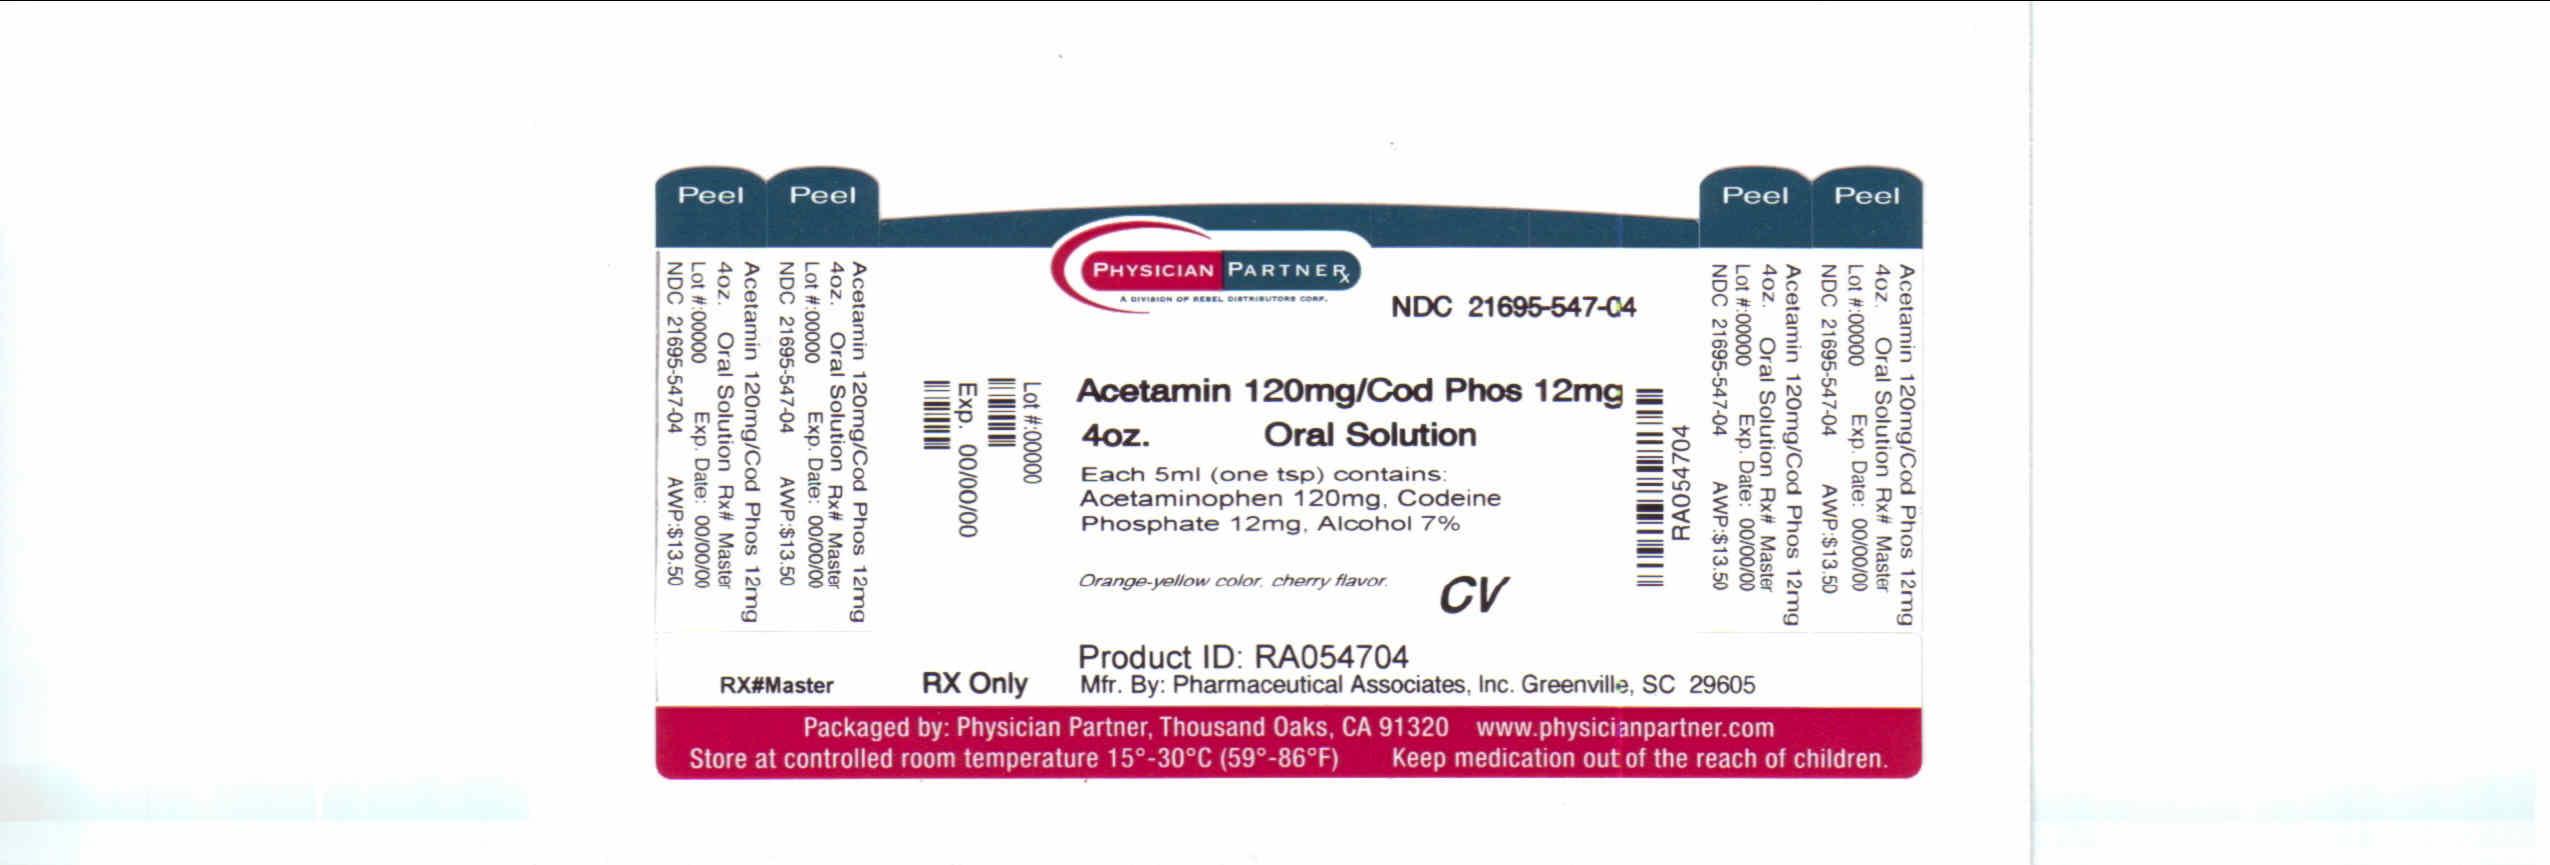 Acet 120mg/Cod Phos 12mg Label